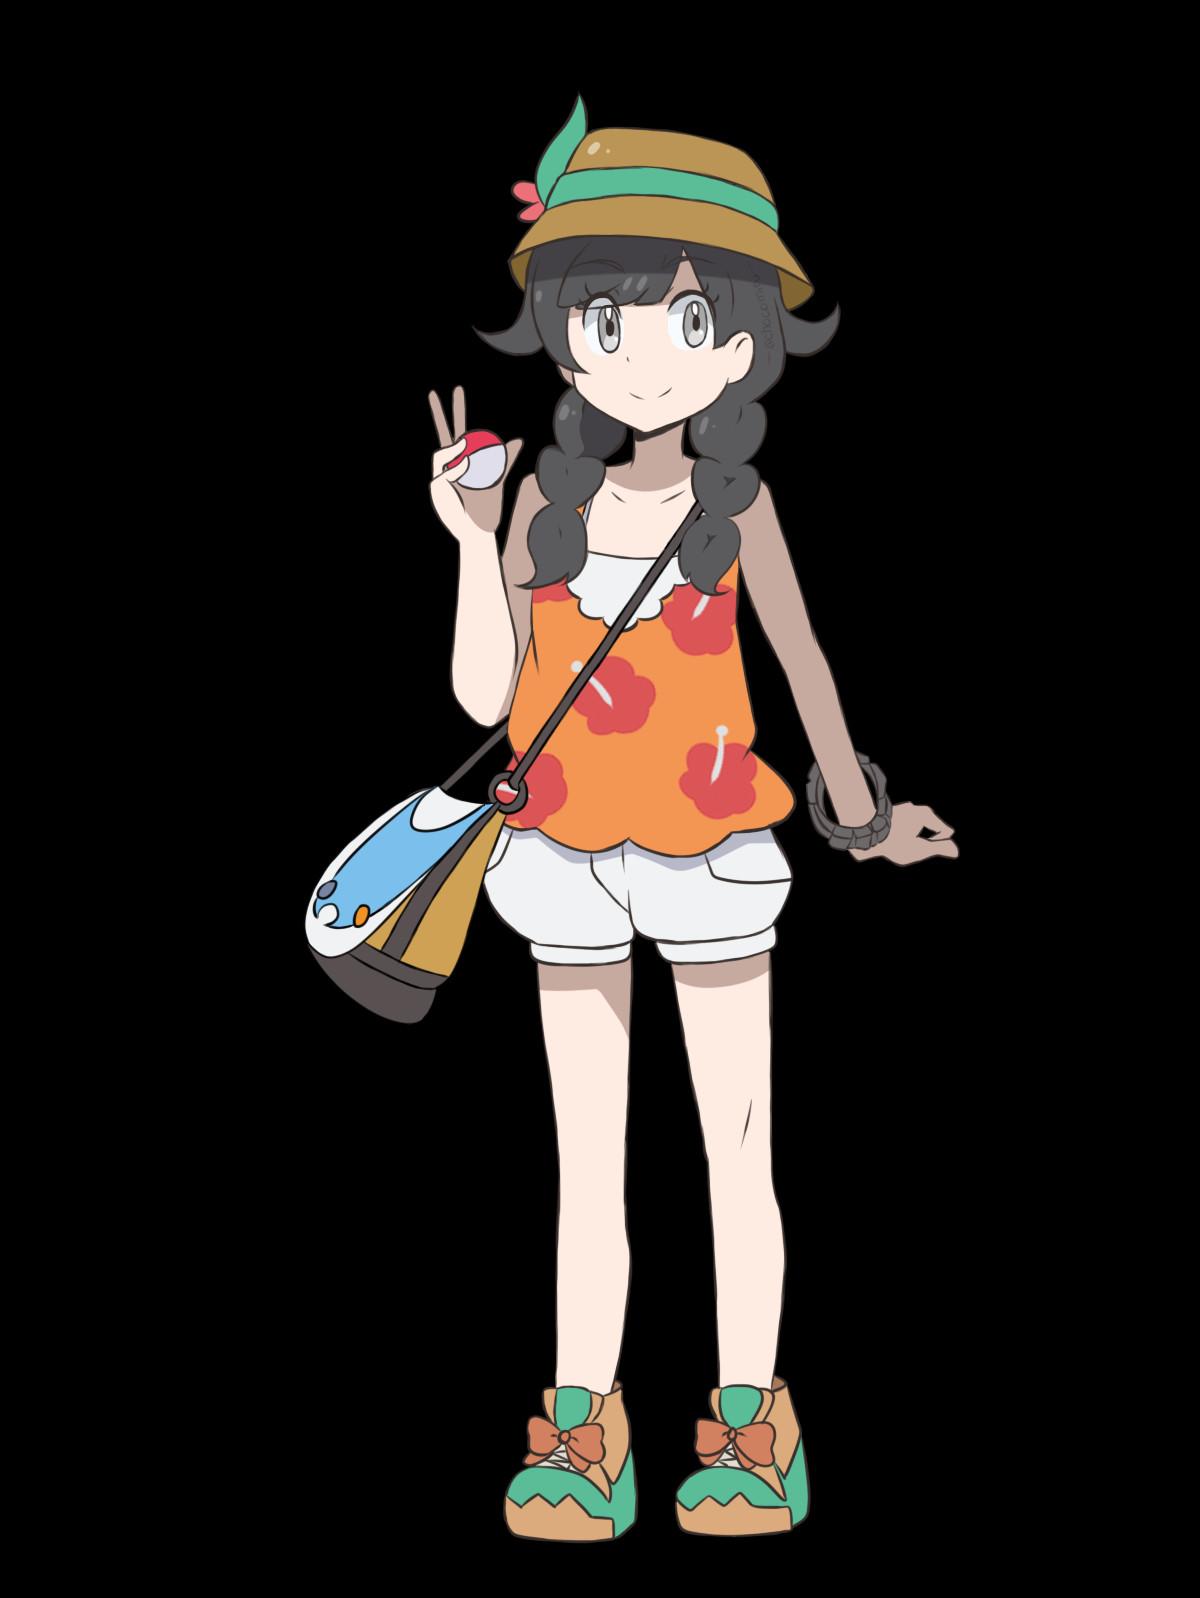 Pokemon Ultrasonne Frisuren  Pokemon USUM Protagonist Anime Style by cho iru02 on